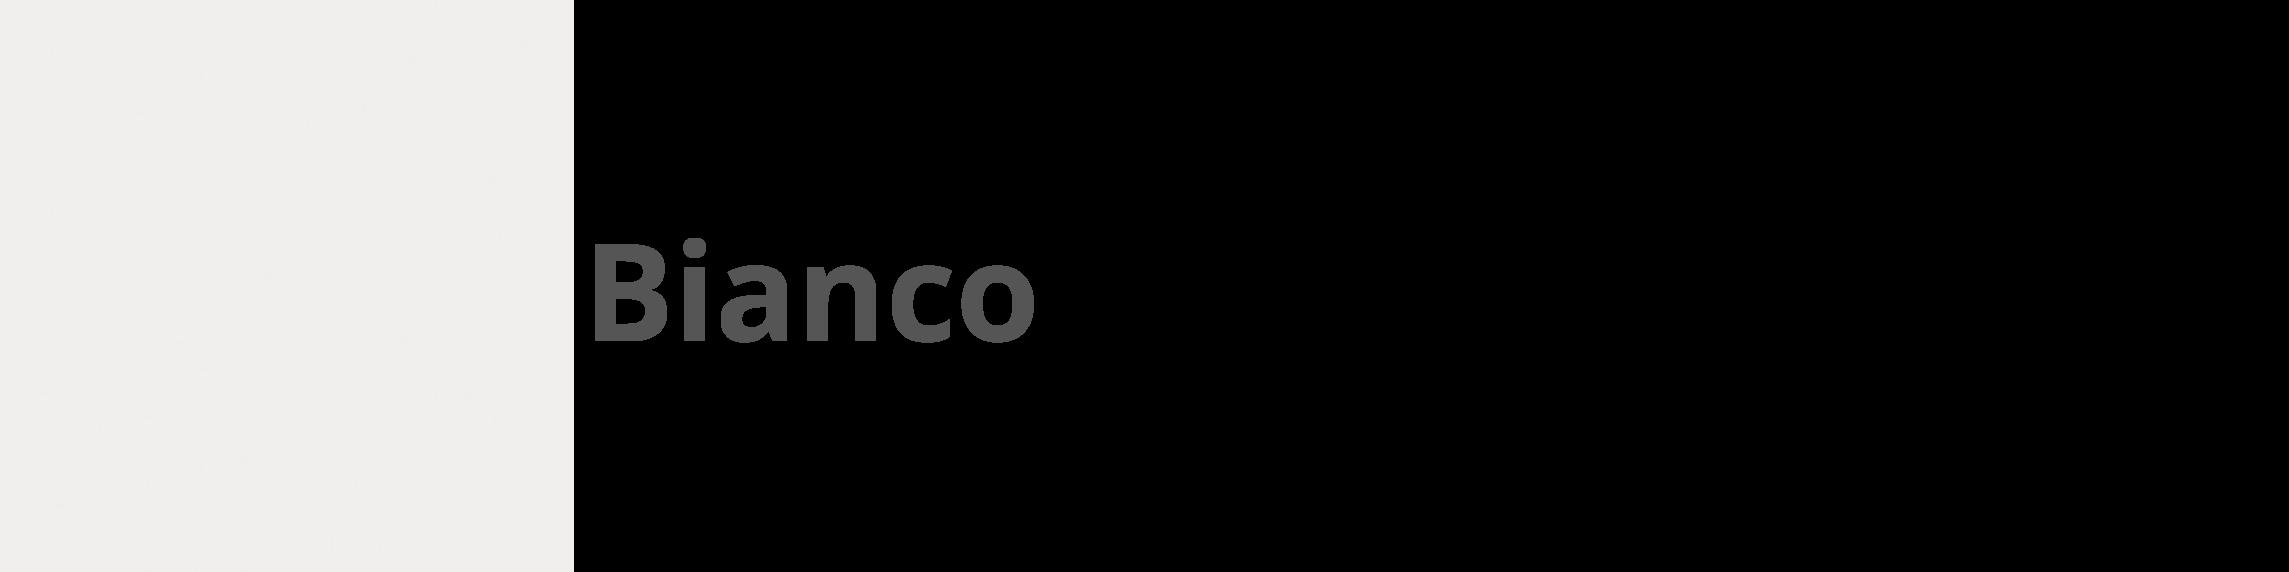 8008 Bianco